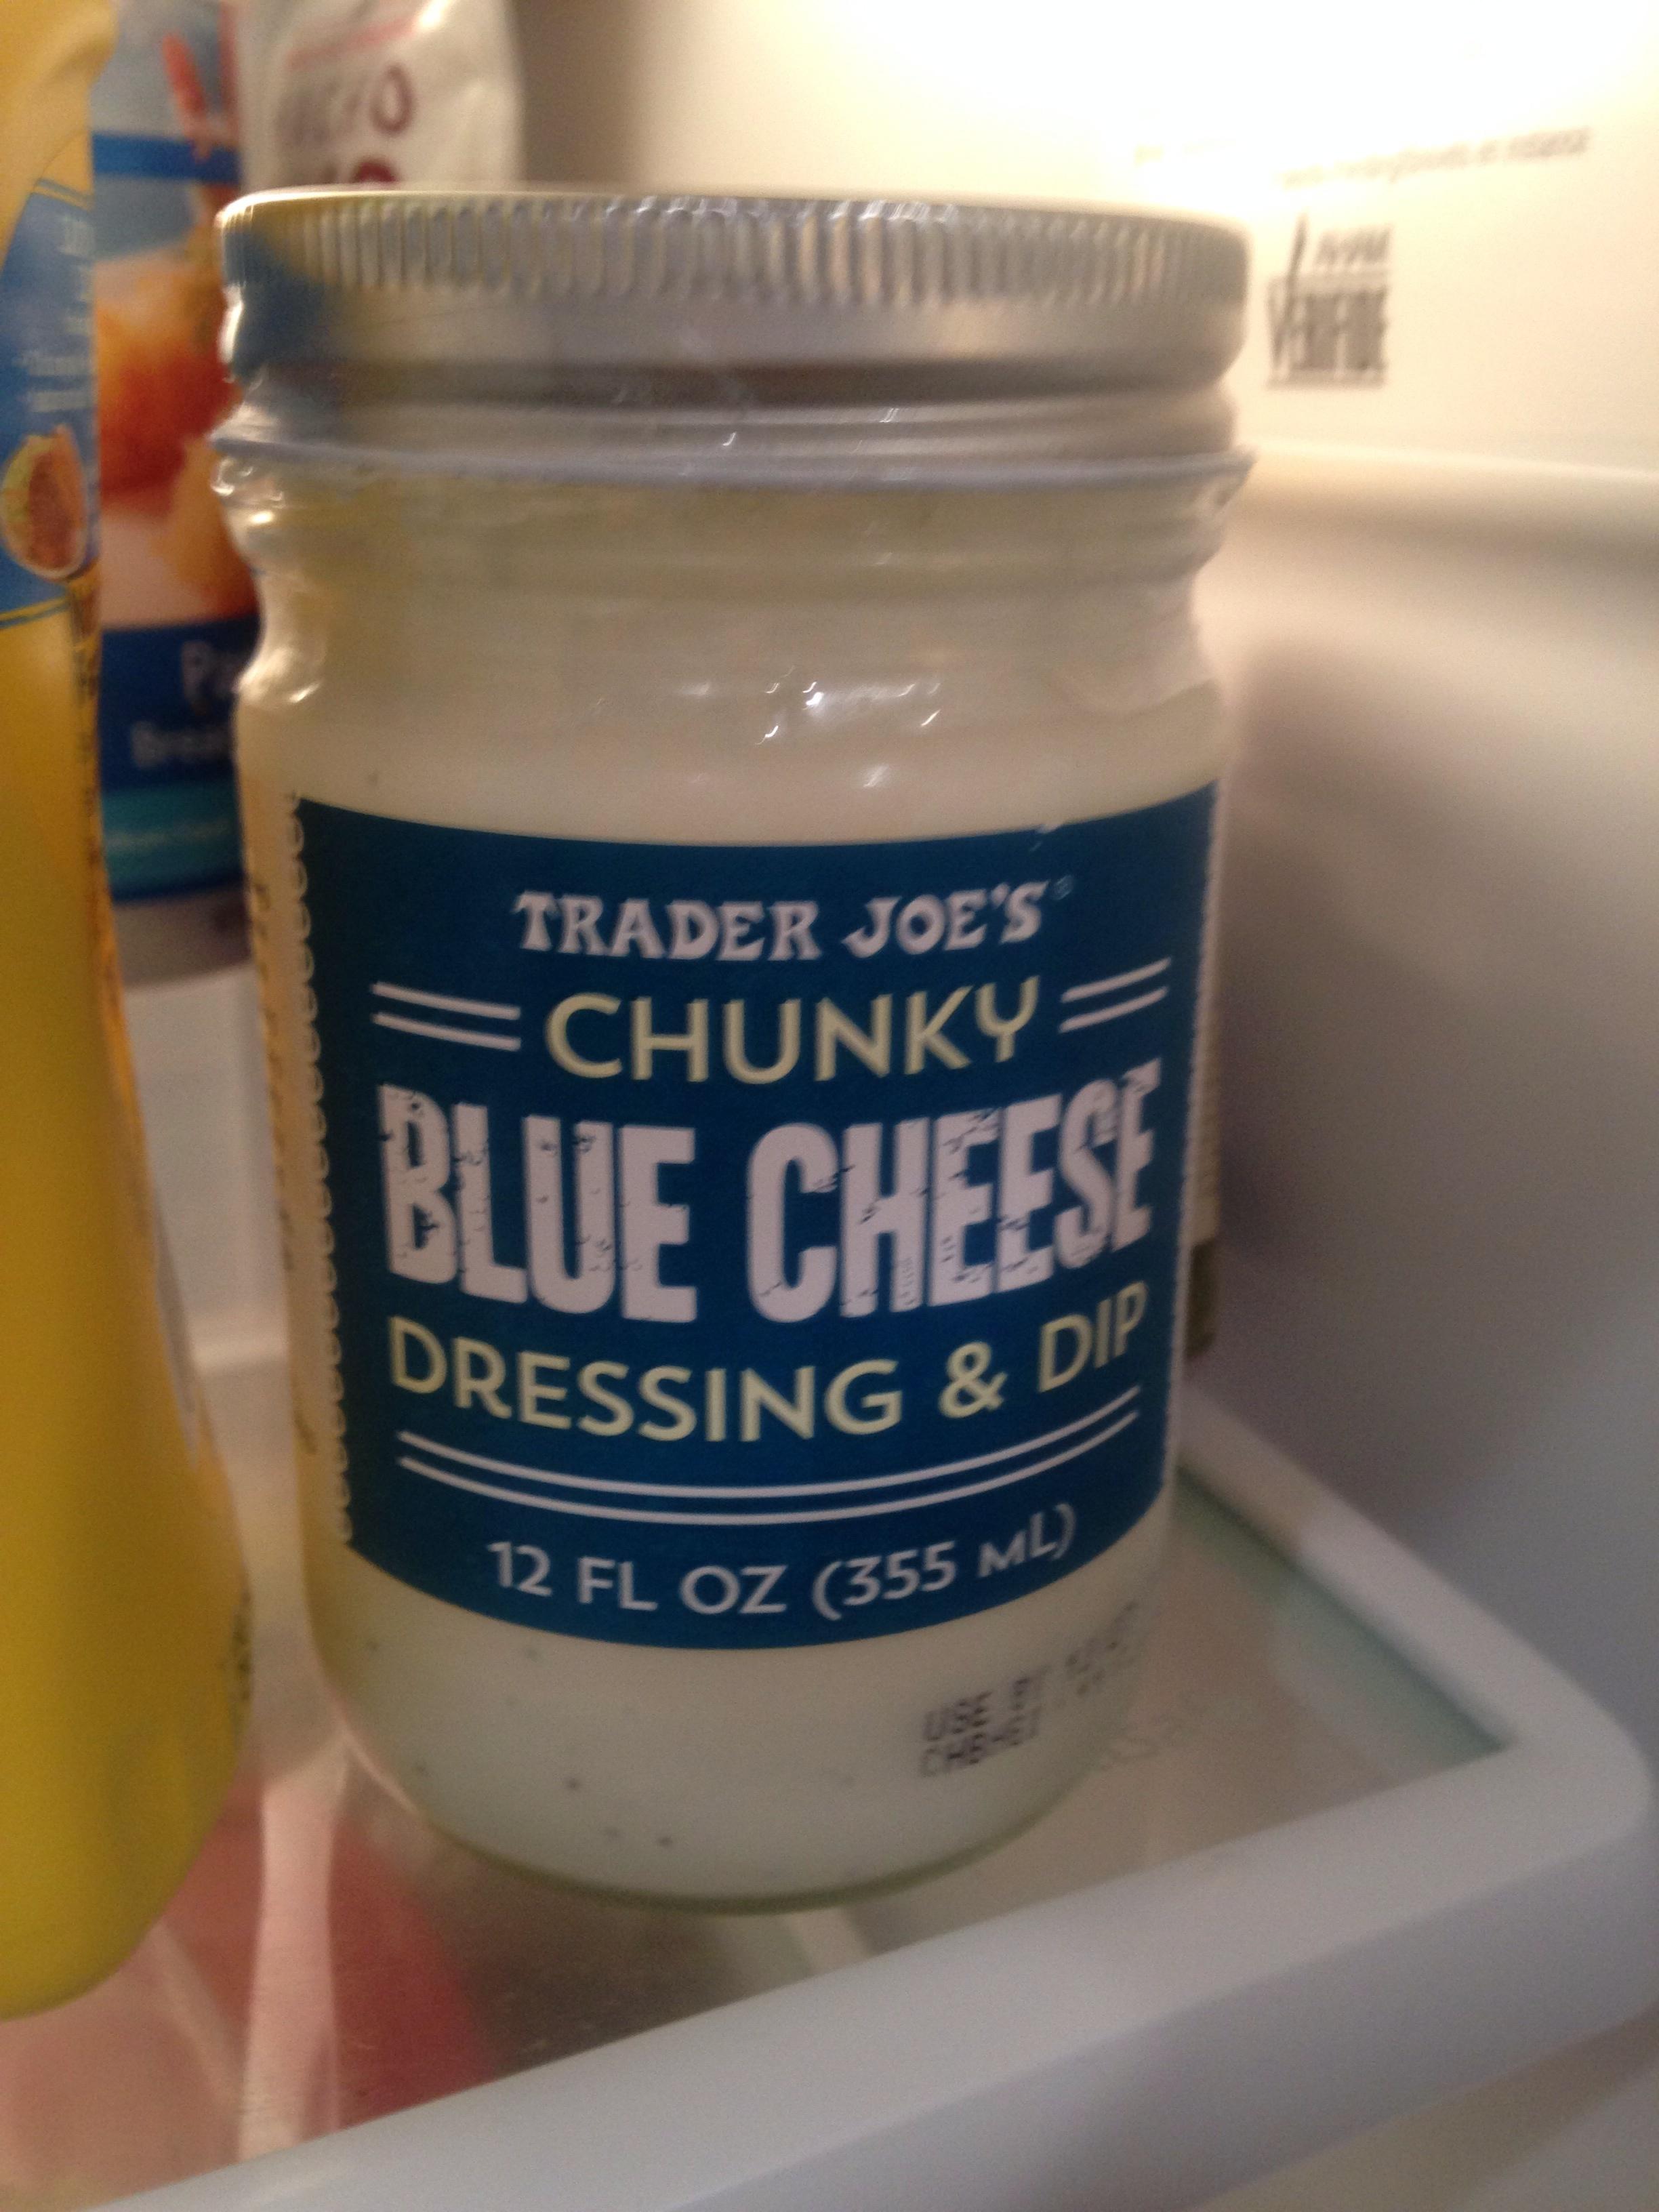 Jar of Trader Joe's Chunky Blue Cheese Dressing, relaxing in refrigerator, Satuday night, San Francisco, Dec. 3, 2016.